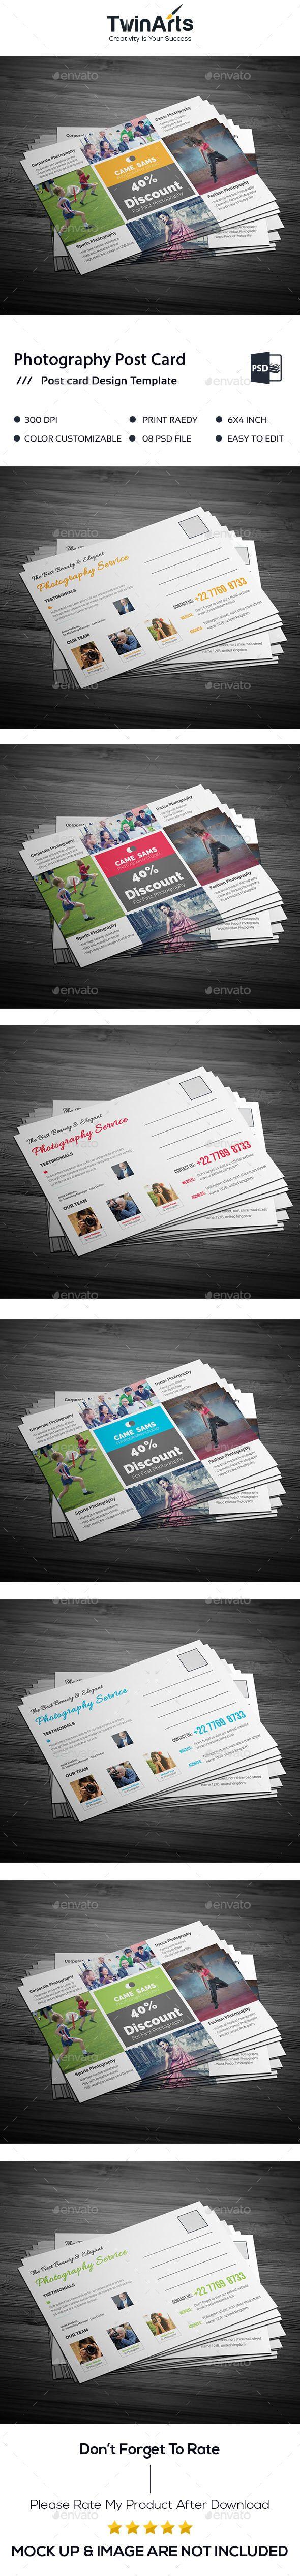 Mejores 166 imágenes de Postcard Templates en Pinterest   Plantilla ...